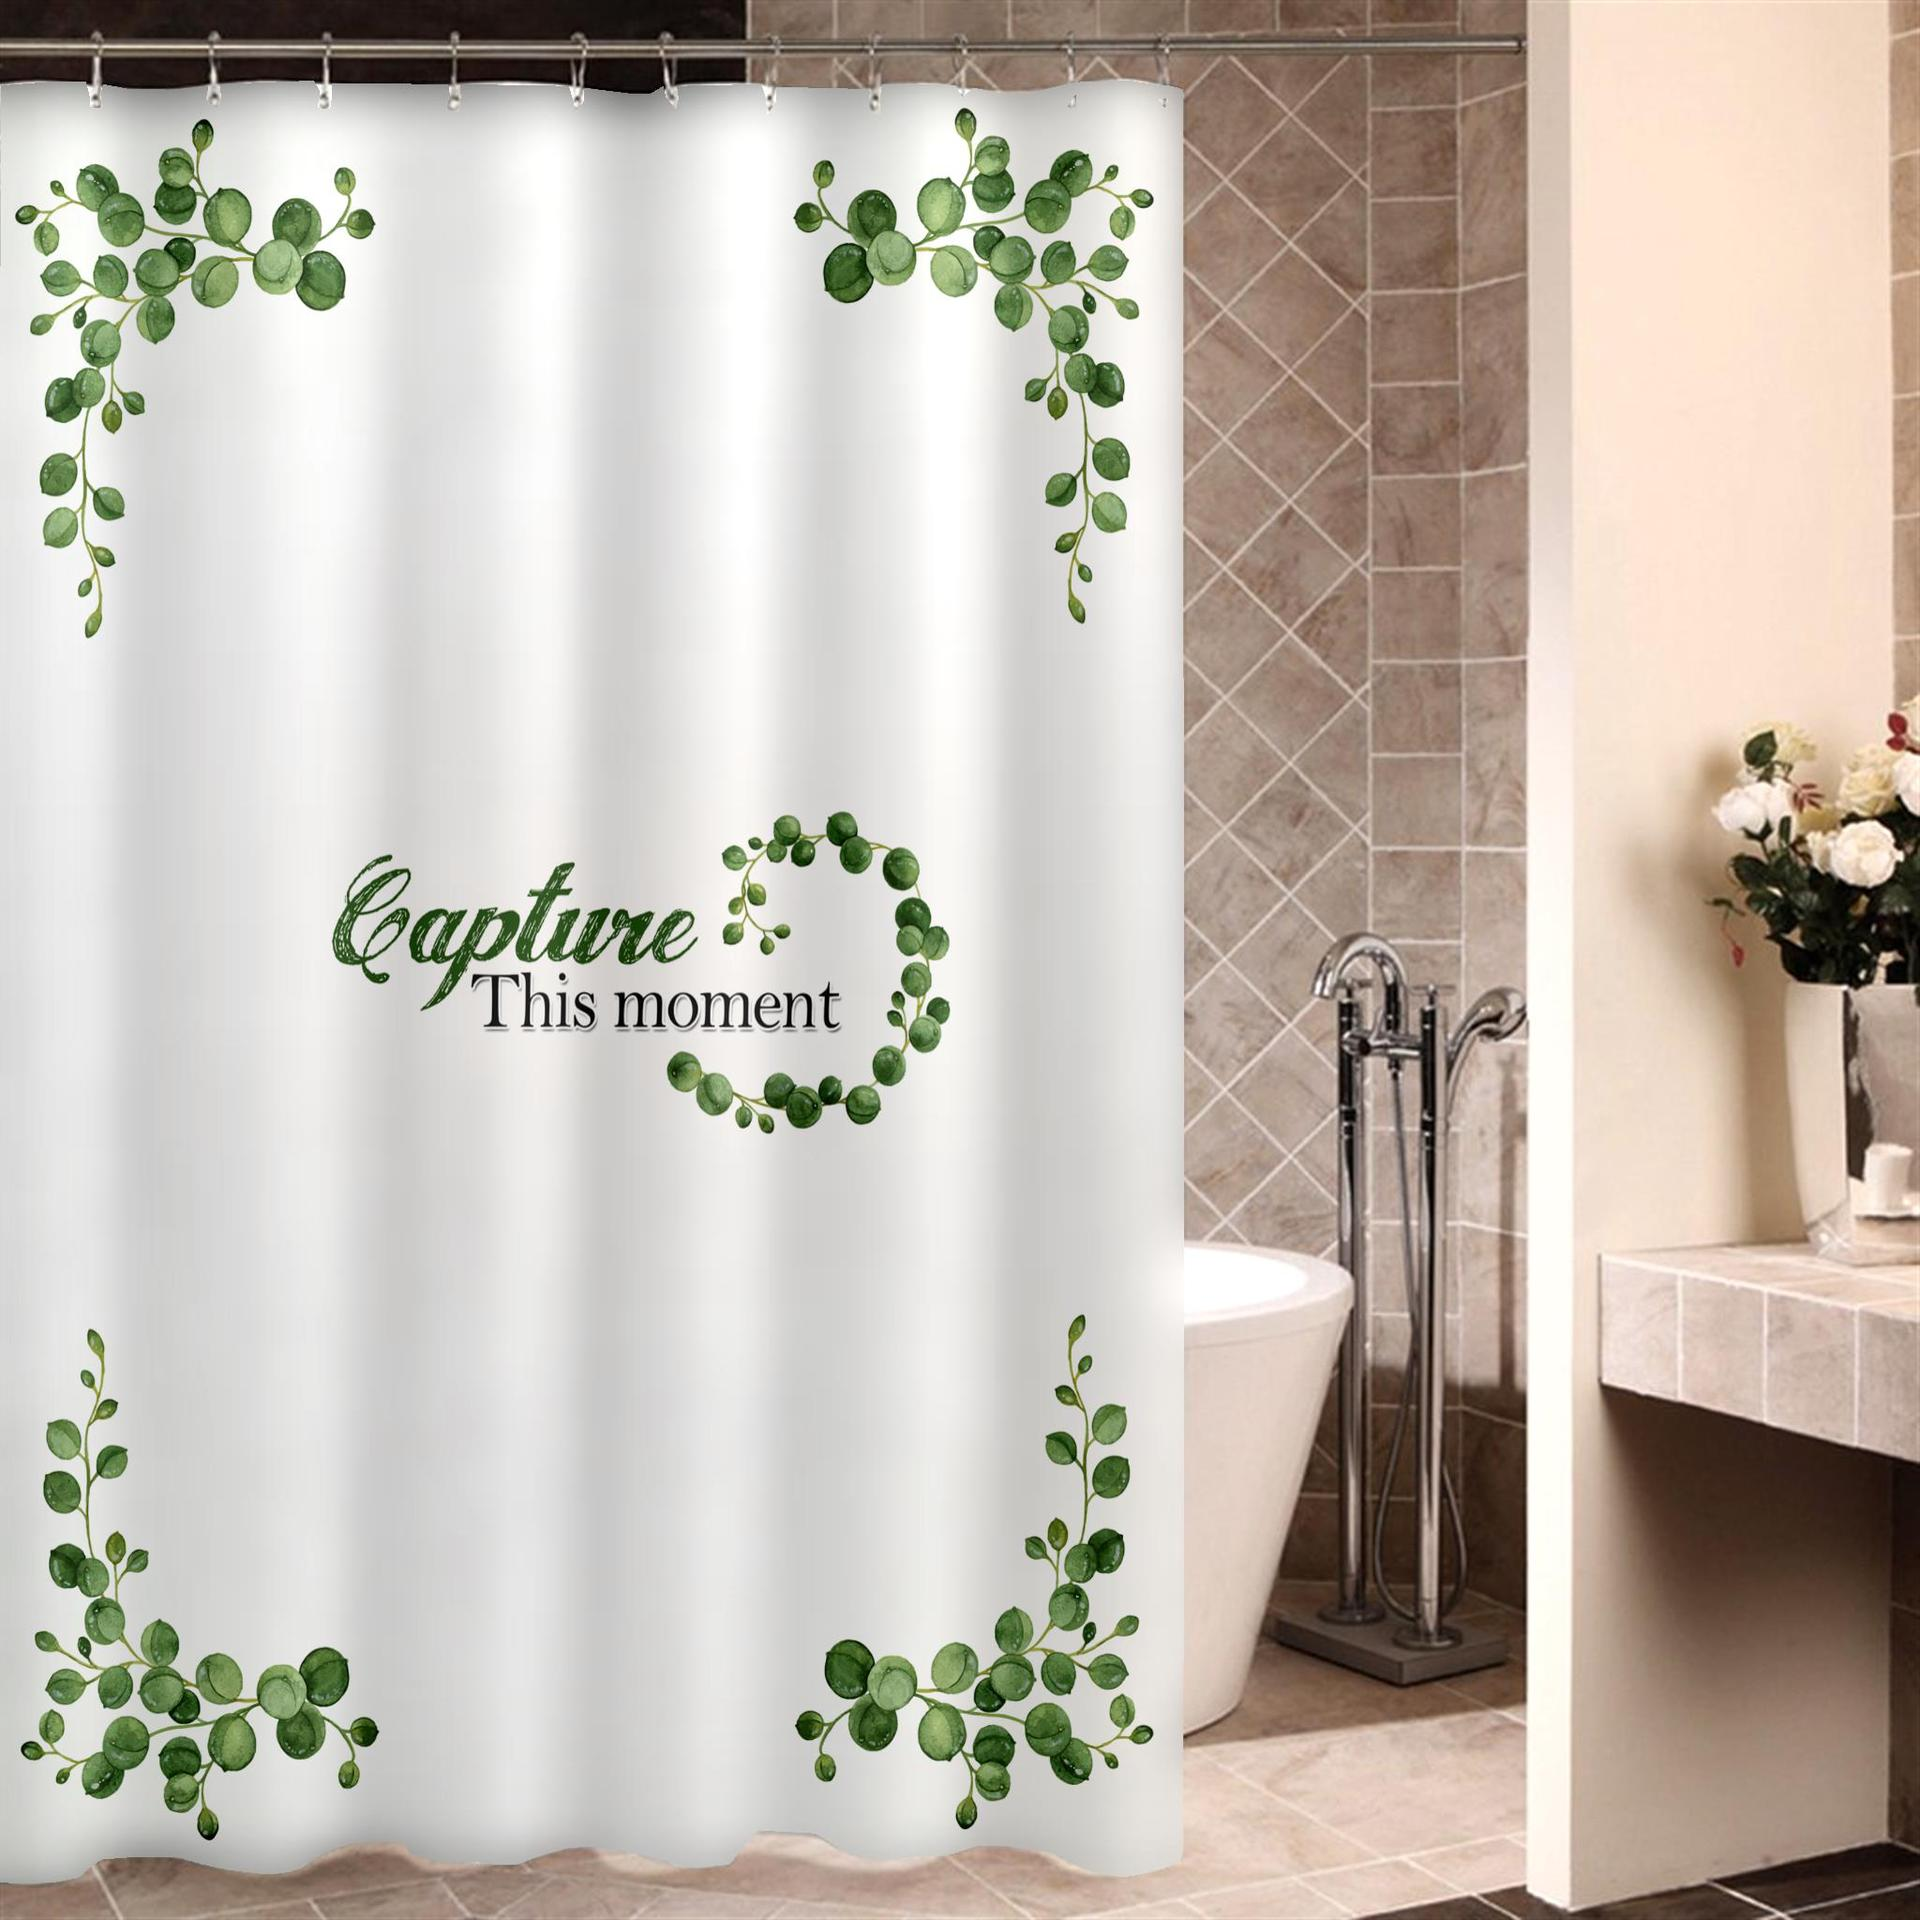 Cortina de ducha con diseño de flores estéticas, Cortina de ducha transparente...